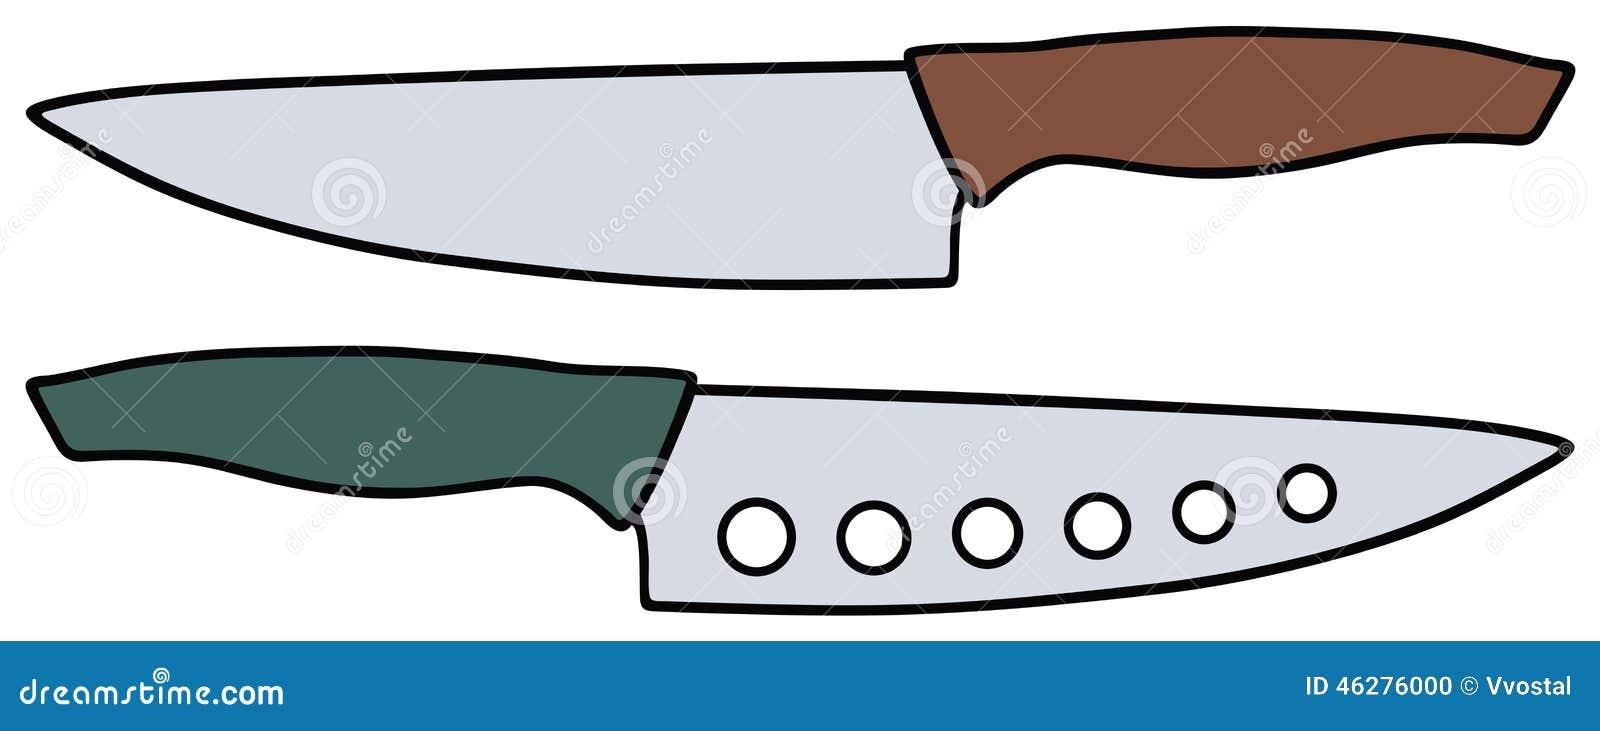 Coltelli da cucina illustrazione vettoriale immagine 46276000 - Coltelli da cucina ...